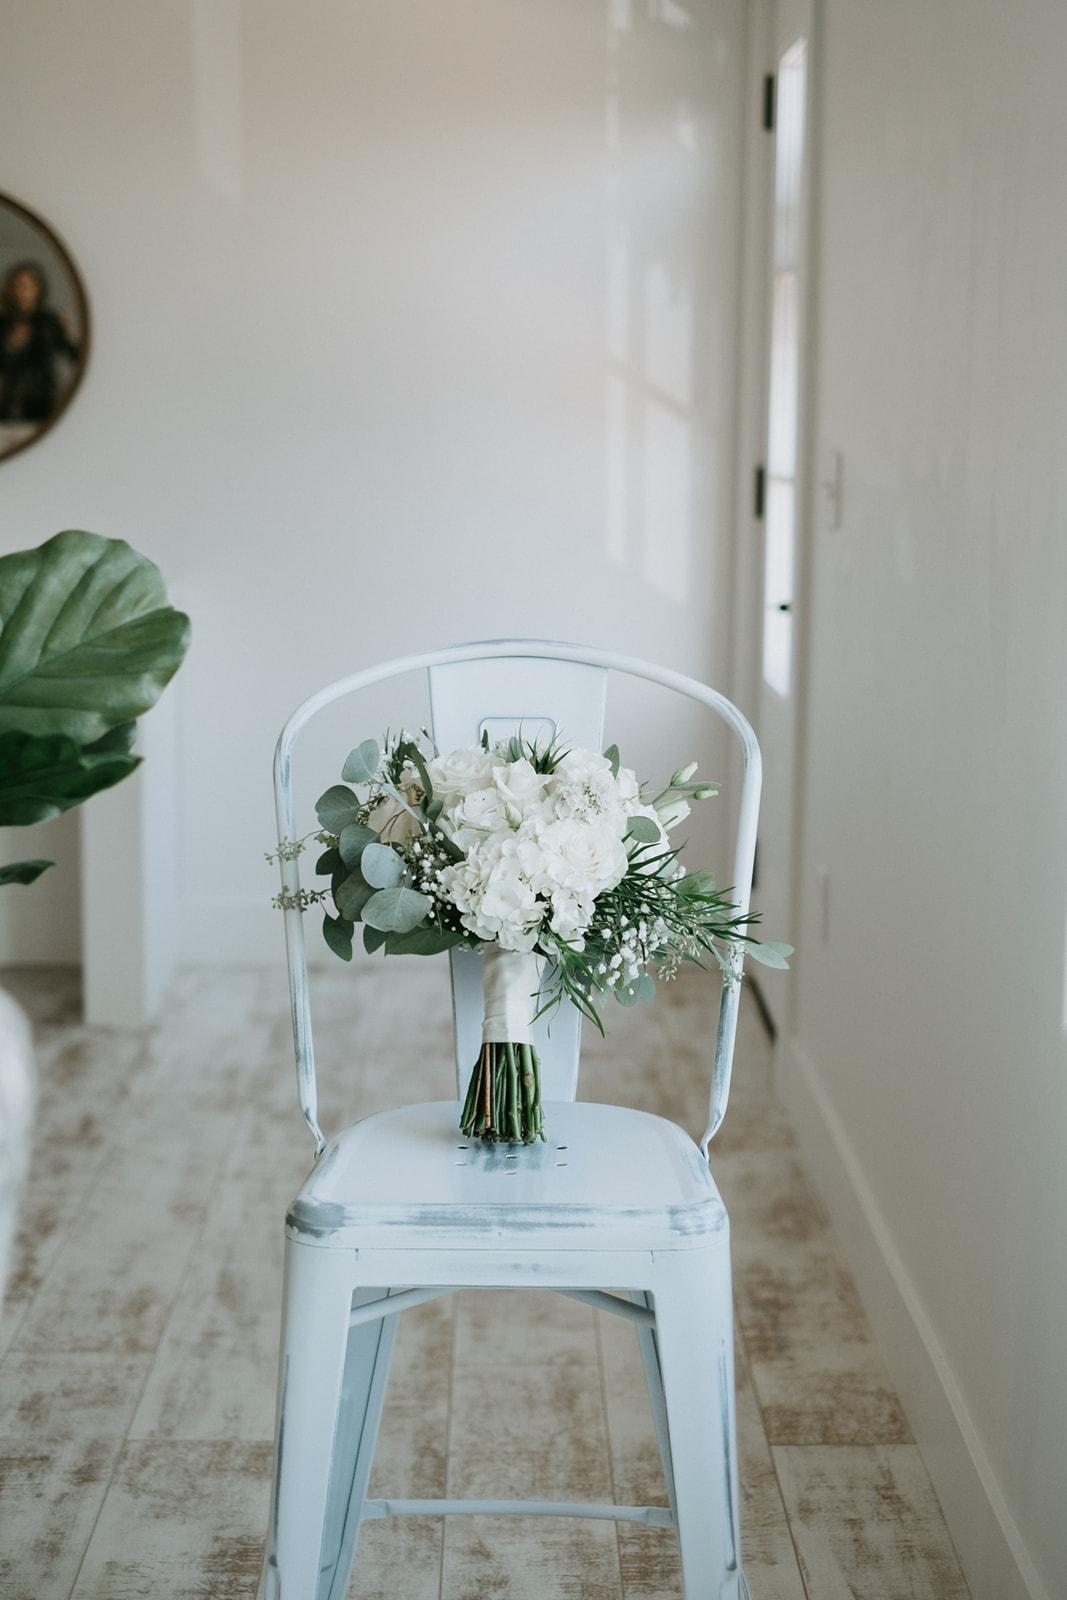 Sanburn-Wedding-Teasers-7.jpg